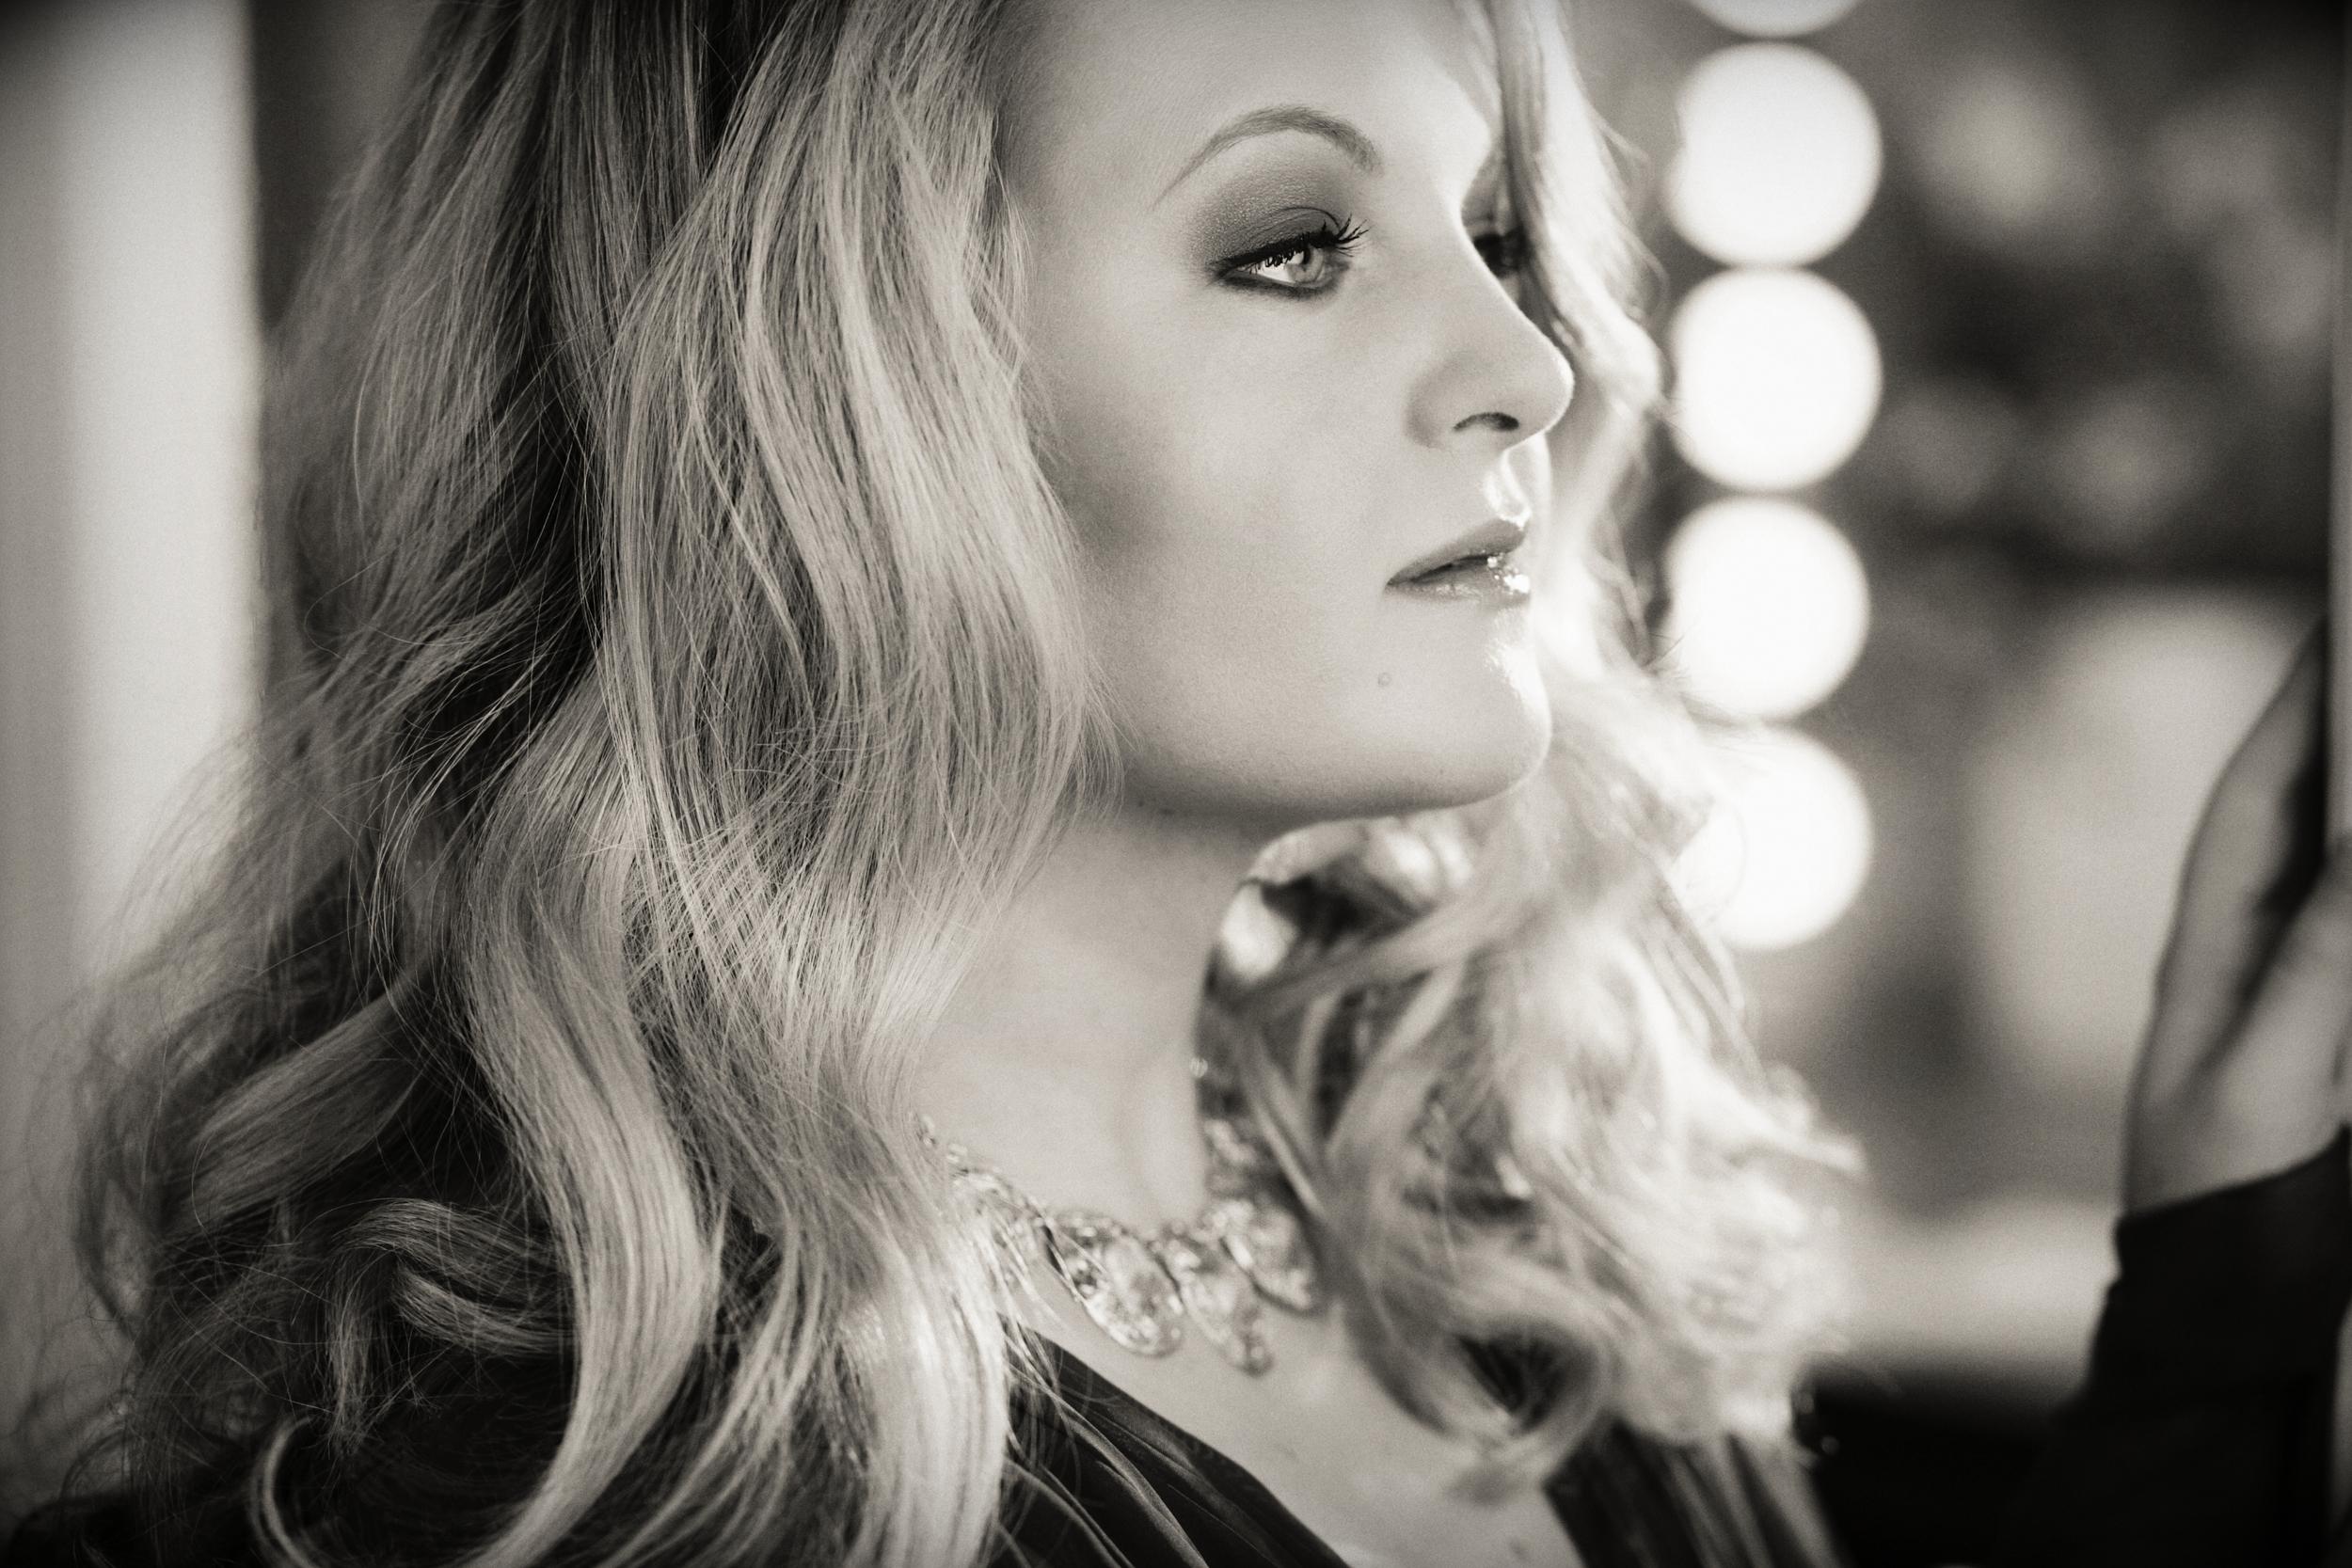 (c) Kristin Hoebermann